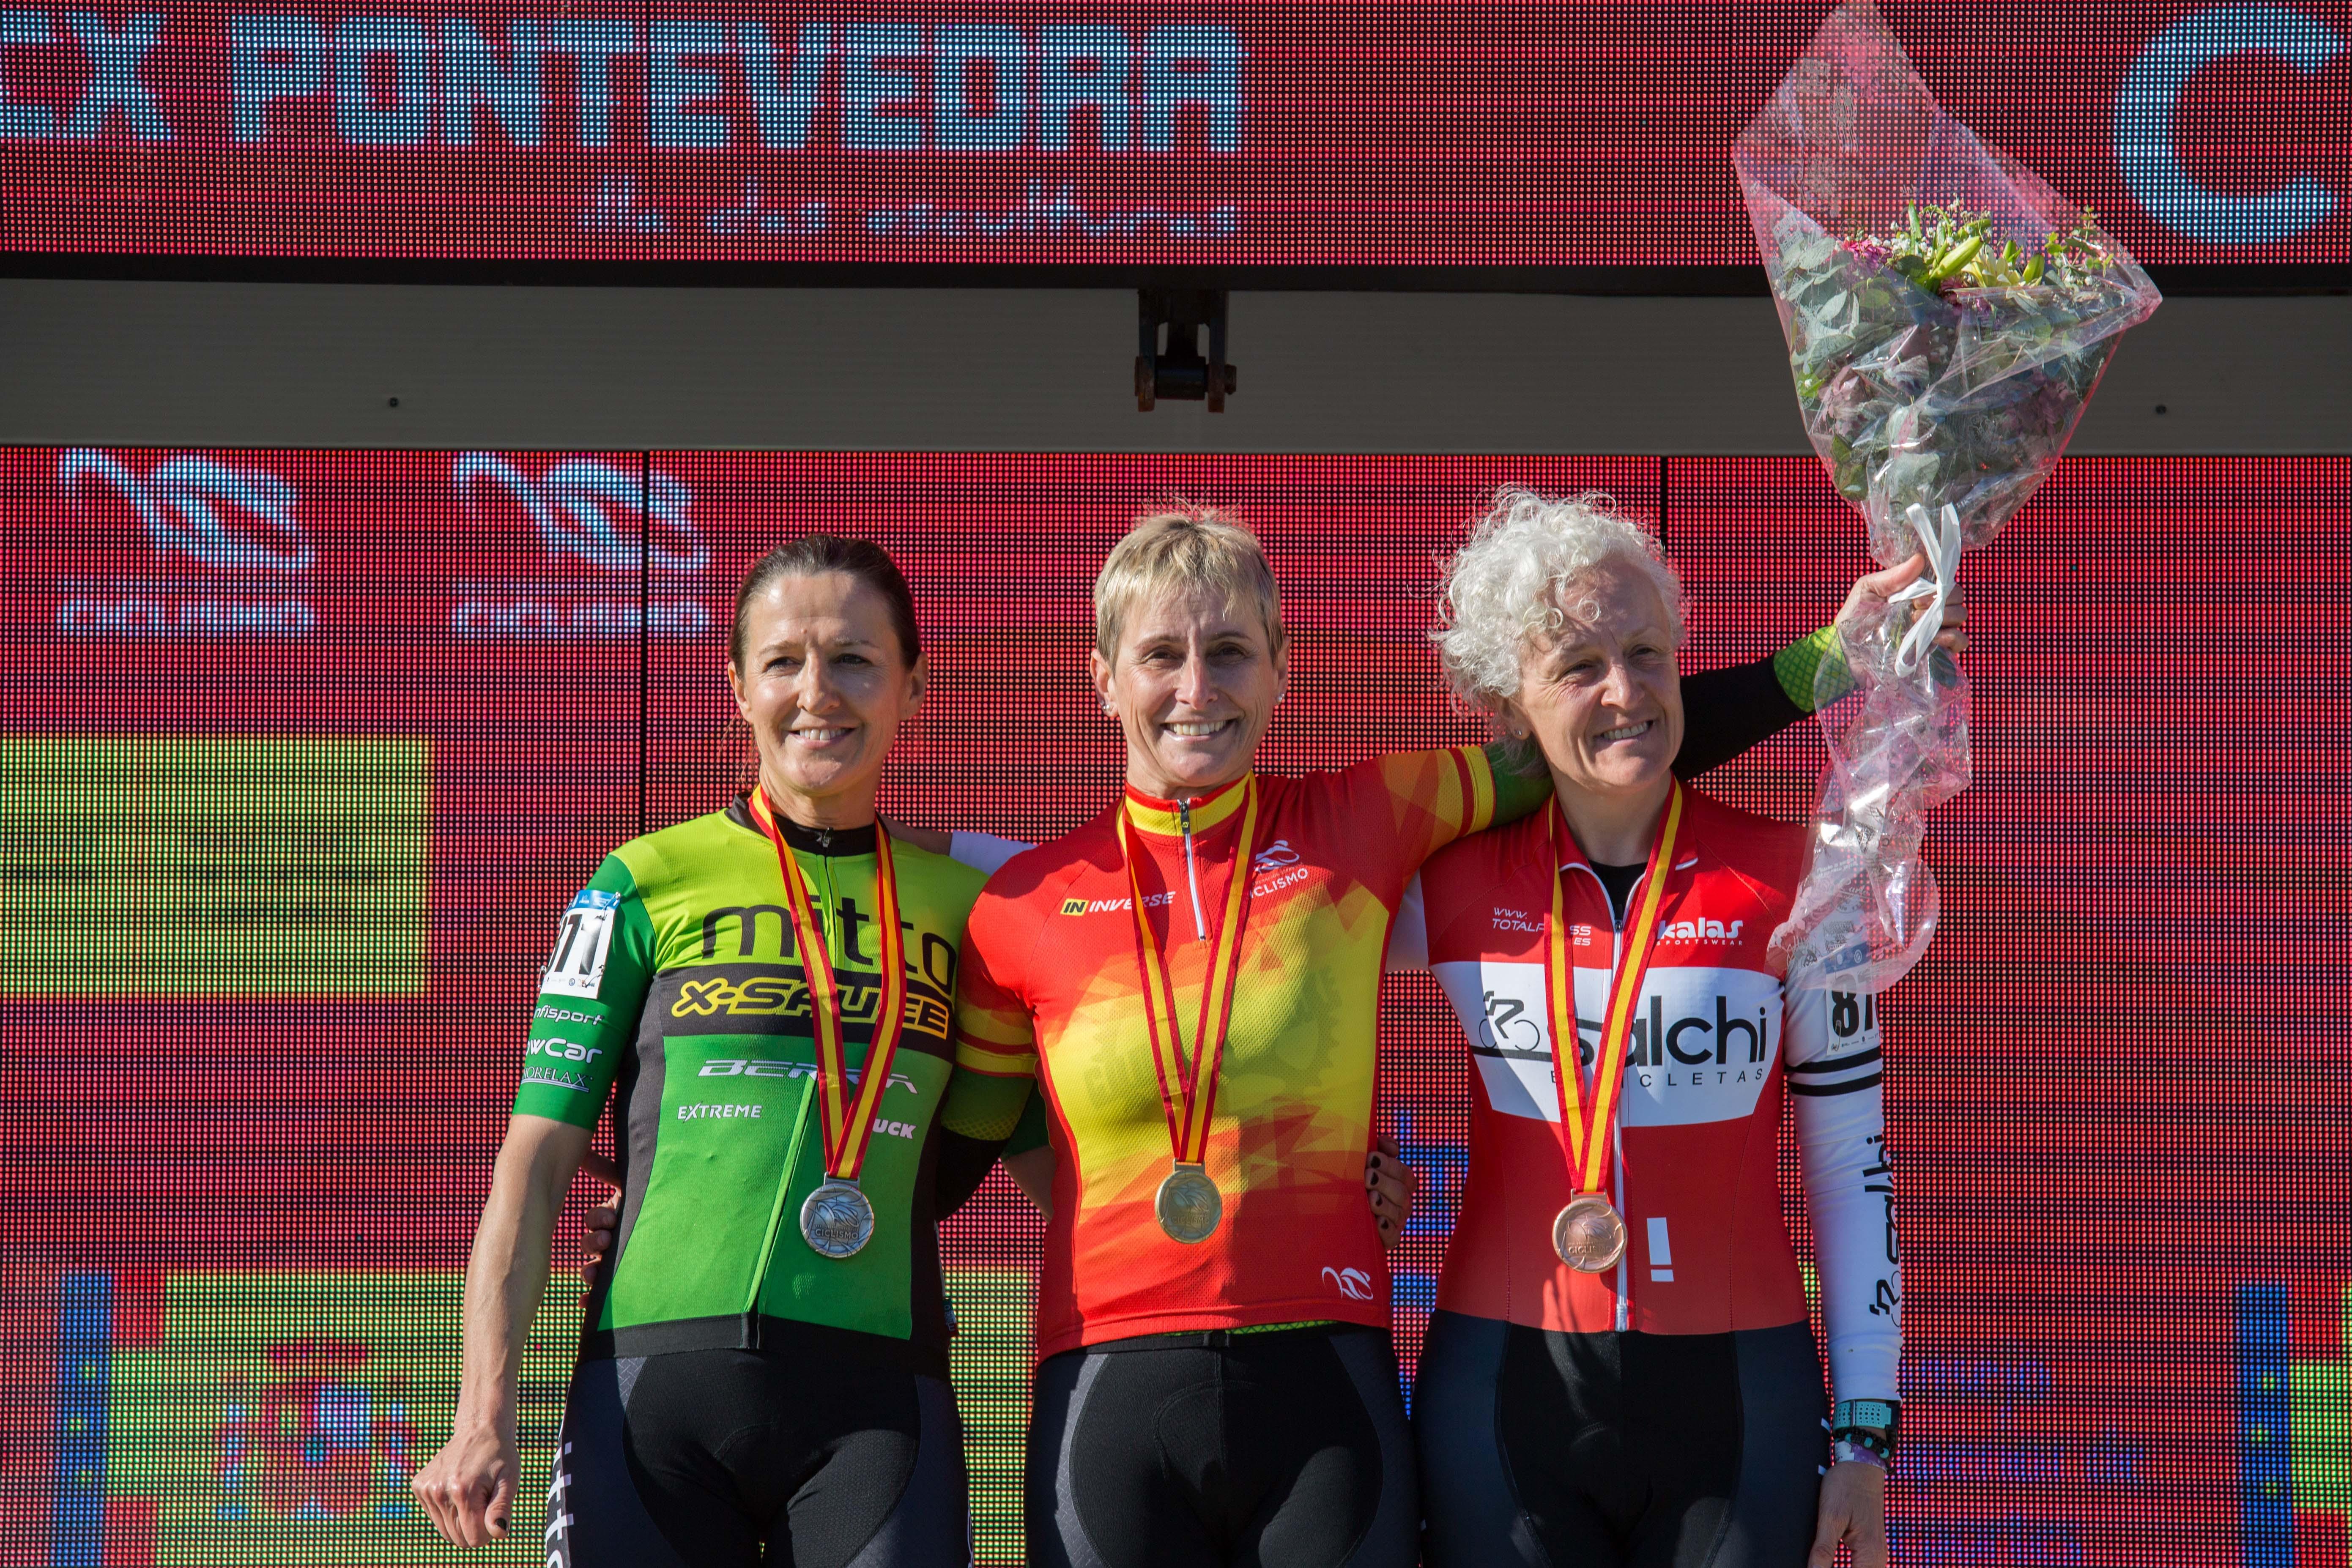 Campeonato de España Ciclocross Pontevedra 2020